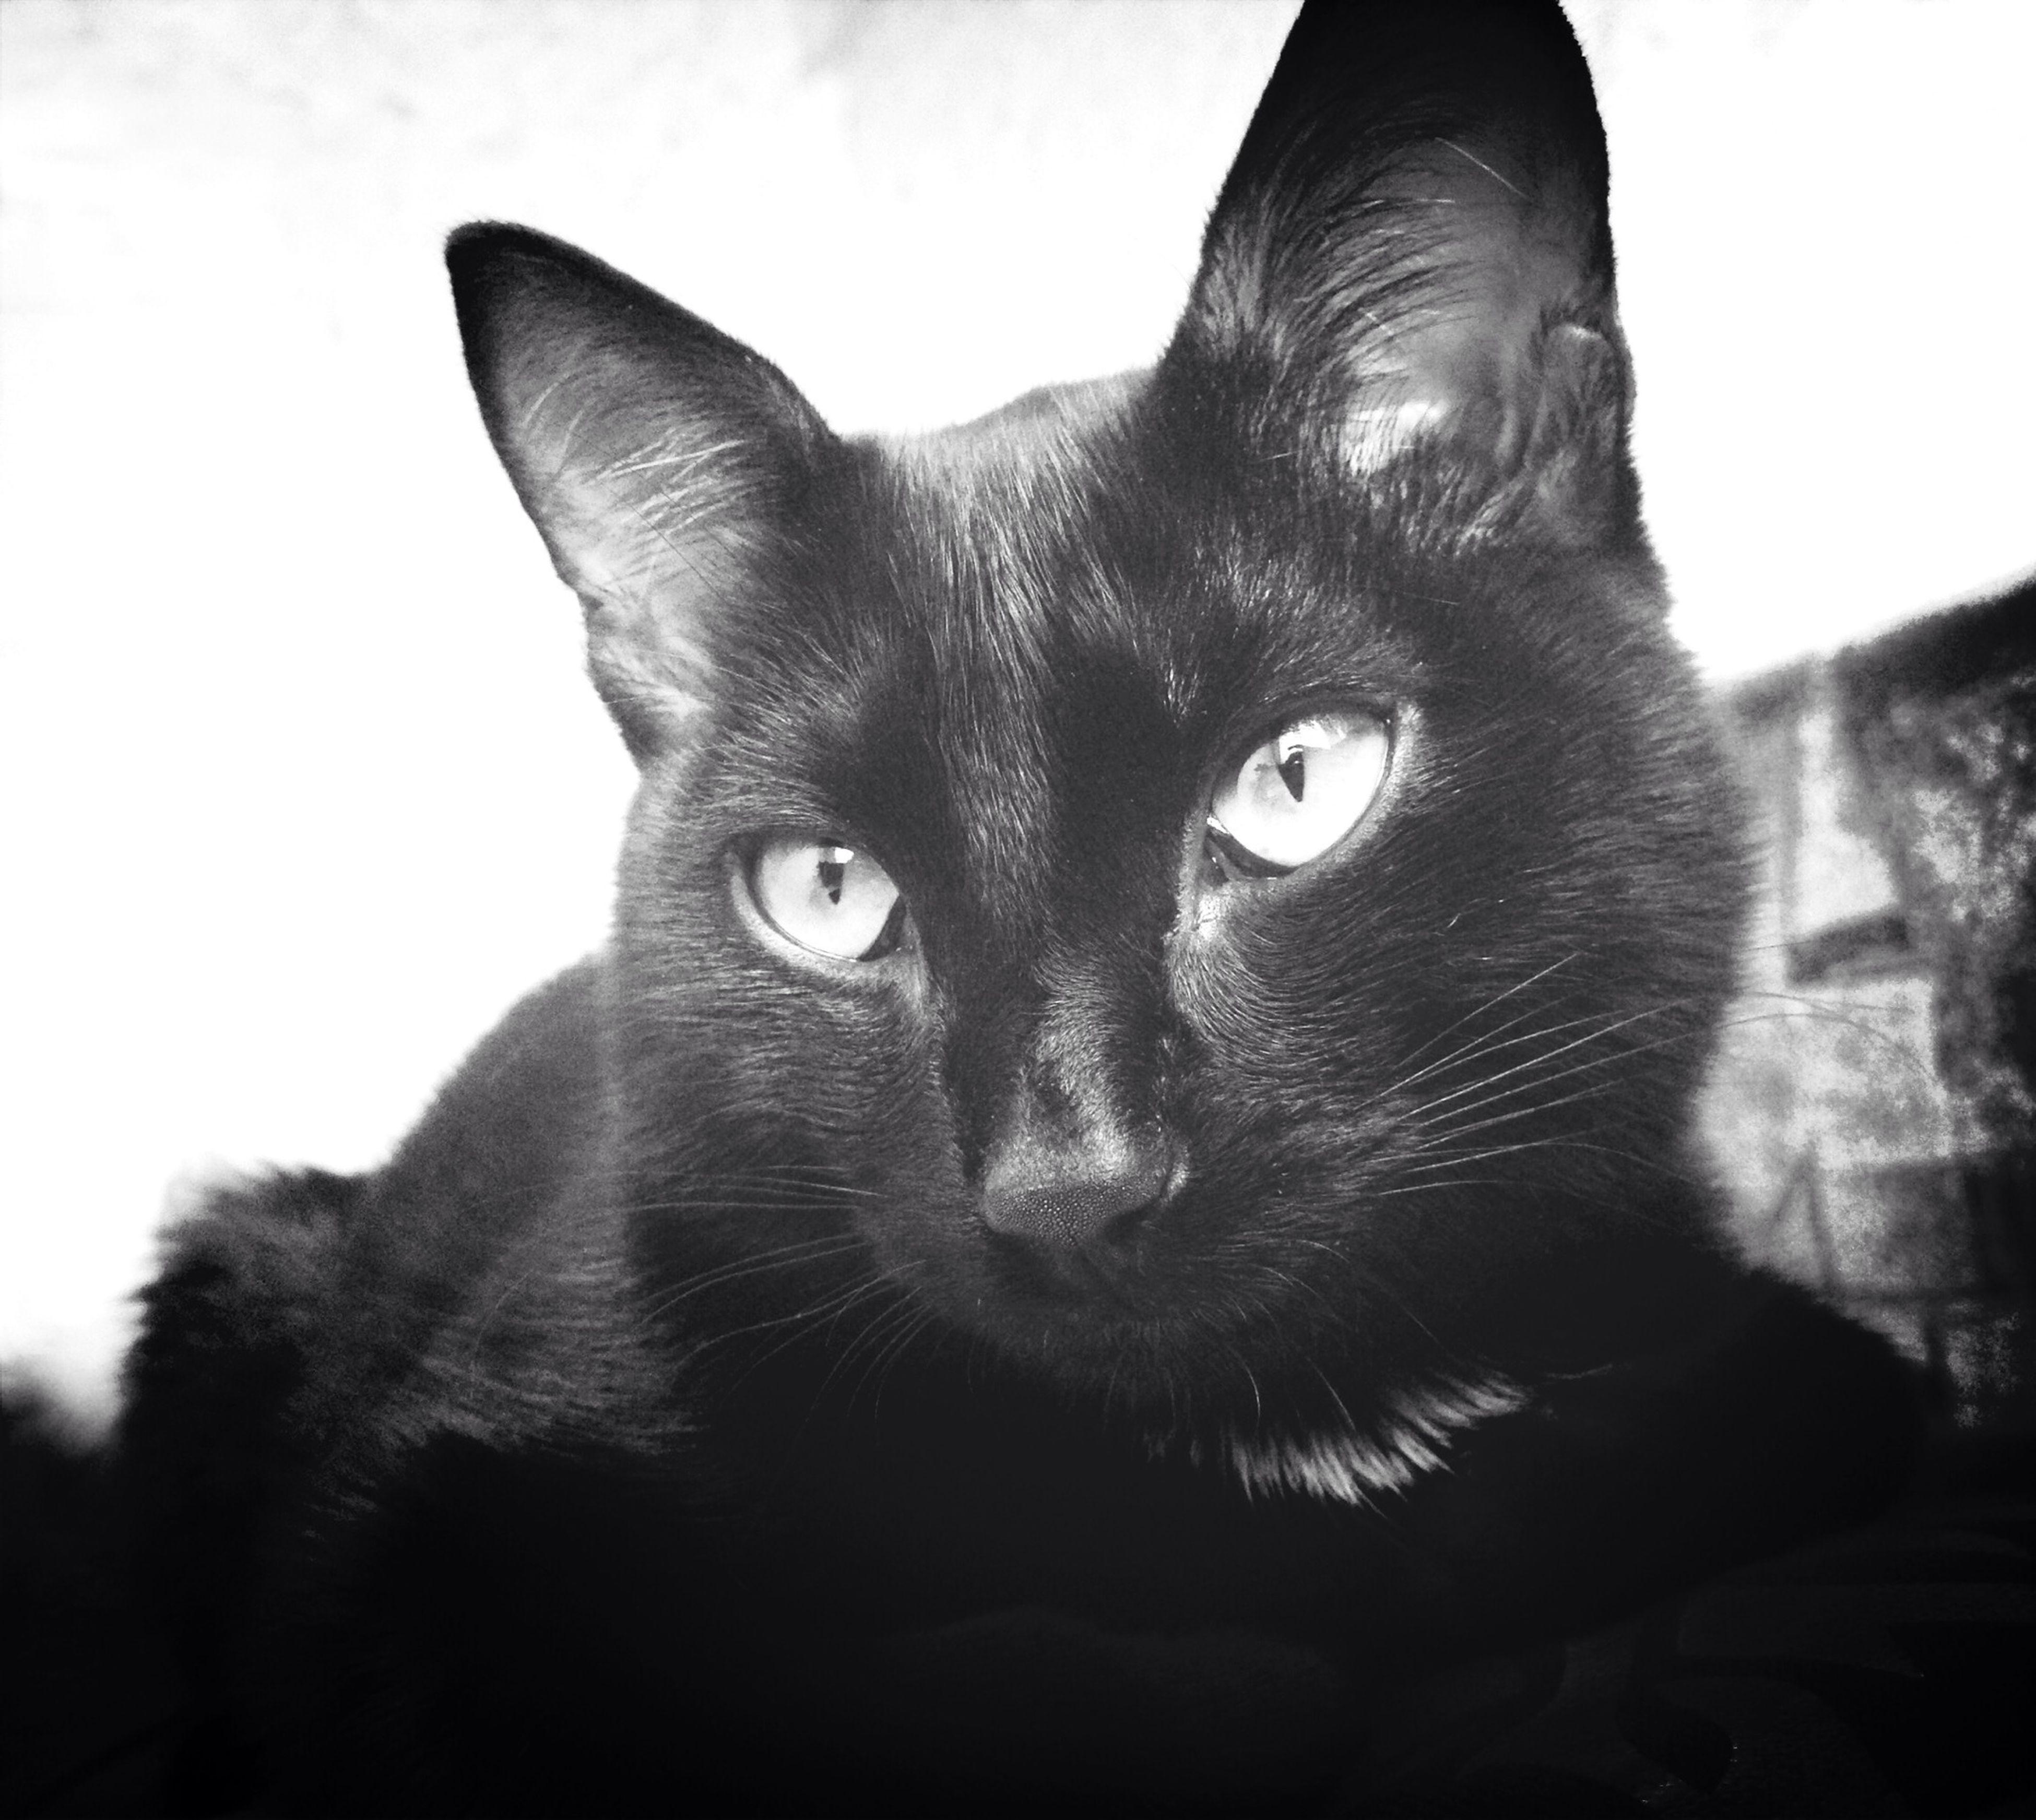 animal themes, one animal, pets, domestic animals, domestic cat, mammal, cat, portrait, black color, looking at camera, feline, whisker, close-up, animal head, indoors, alertness, staring, animal eye, black